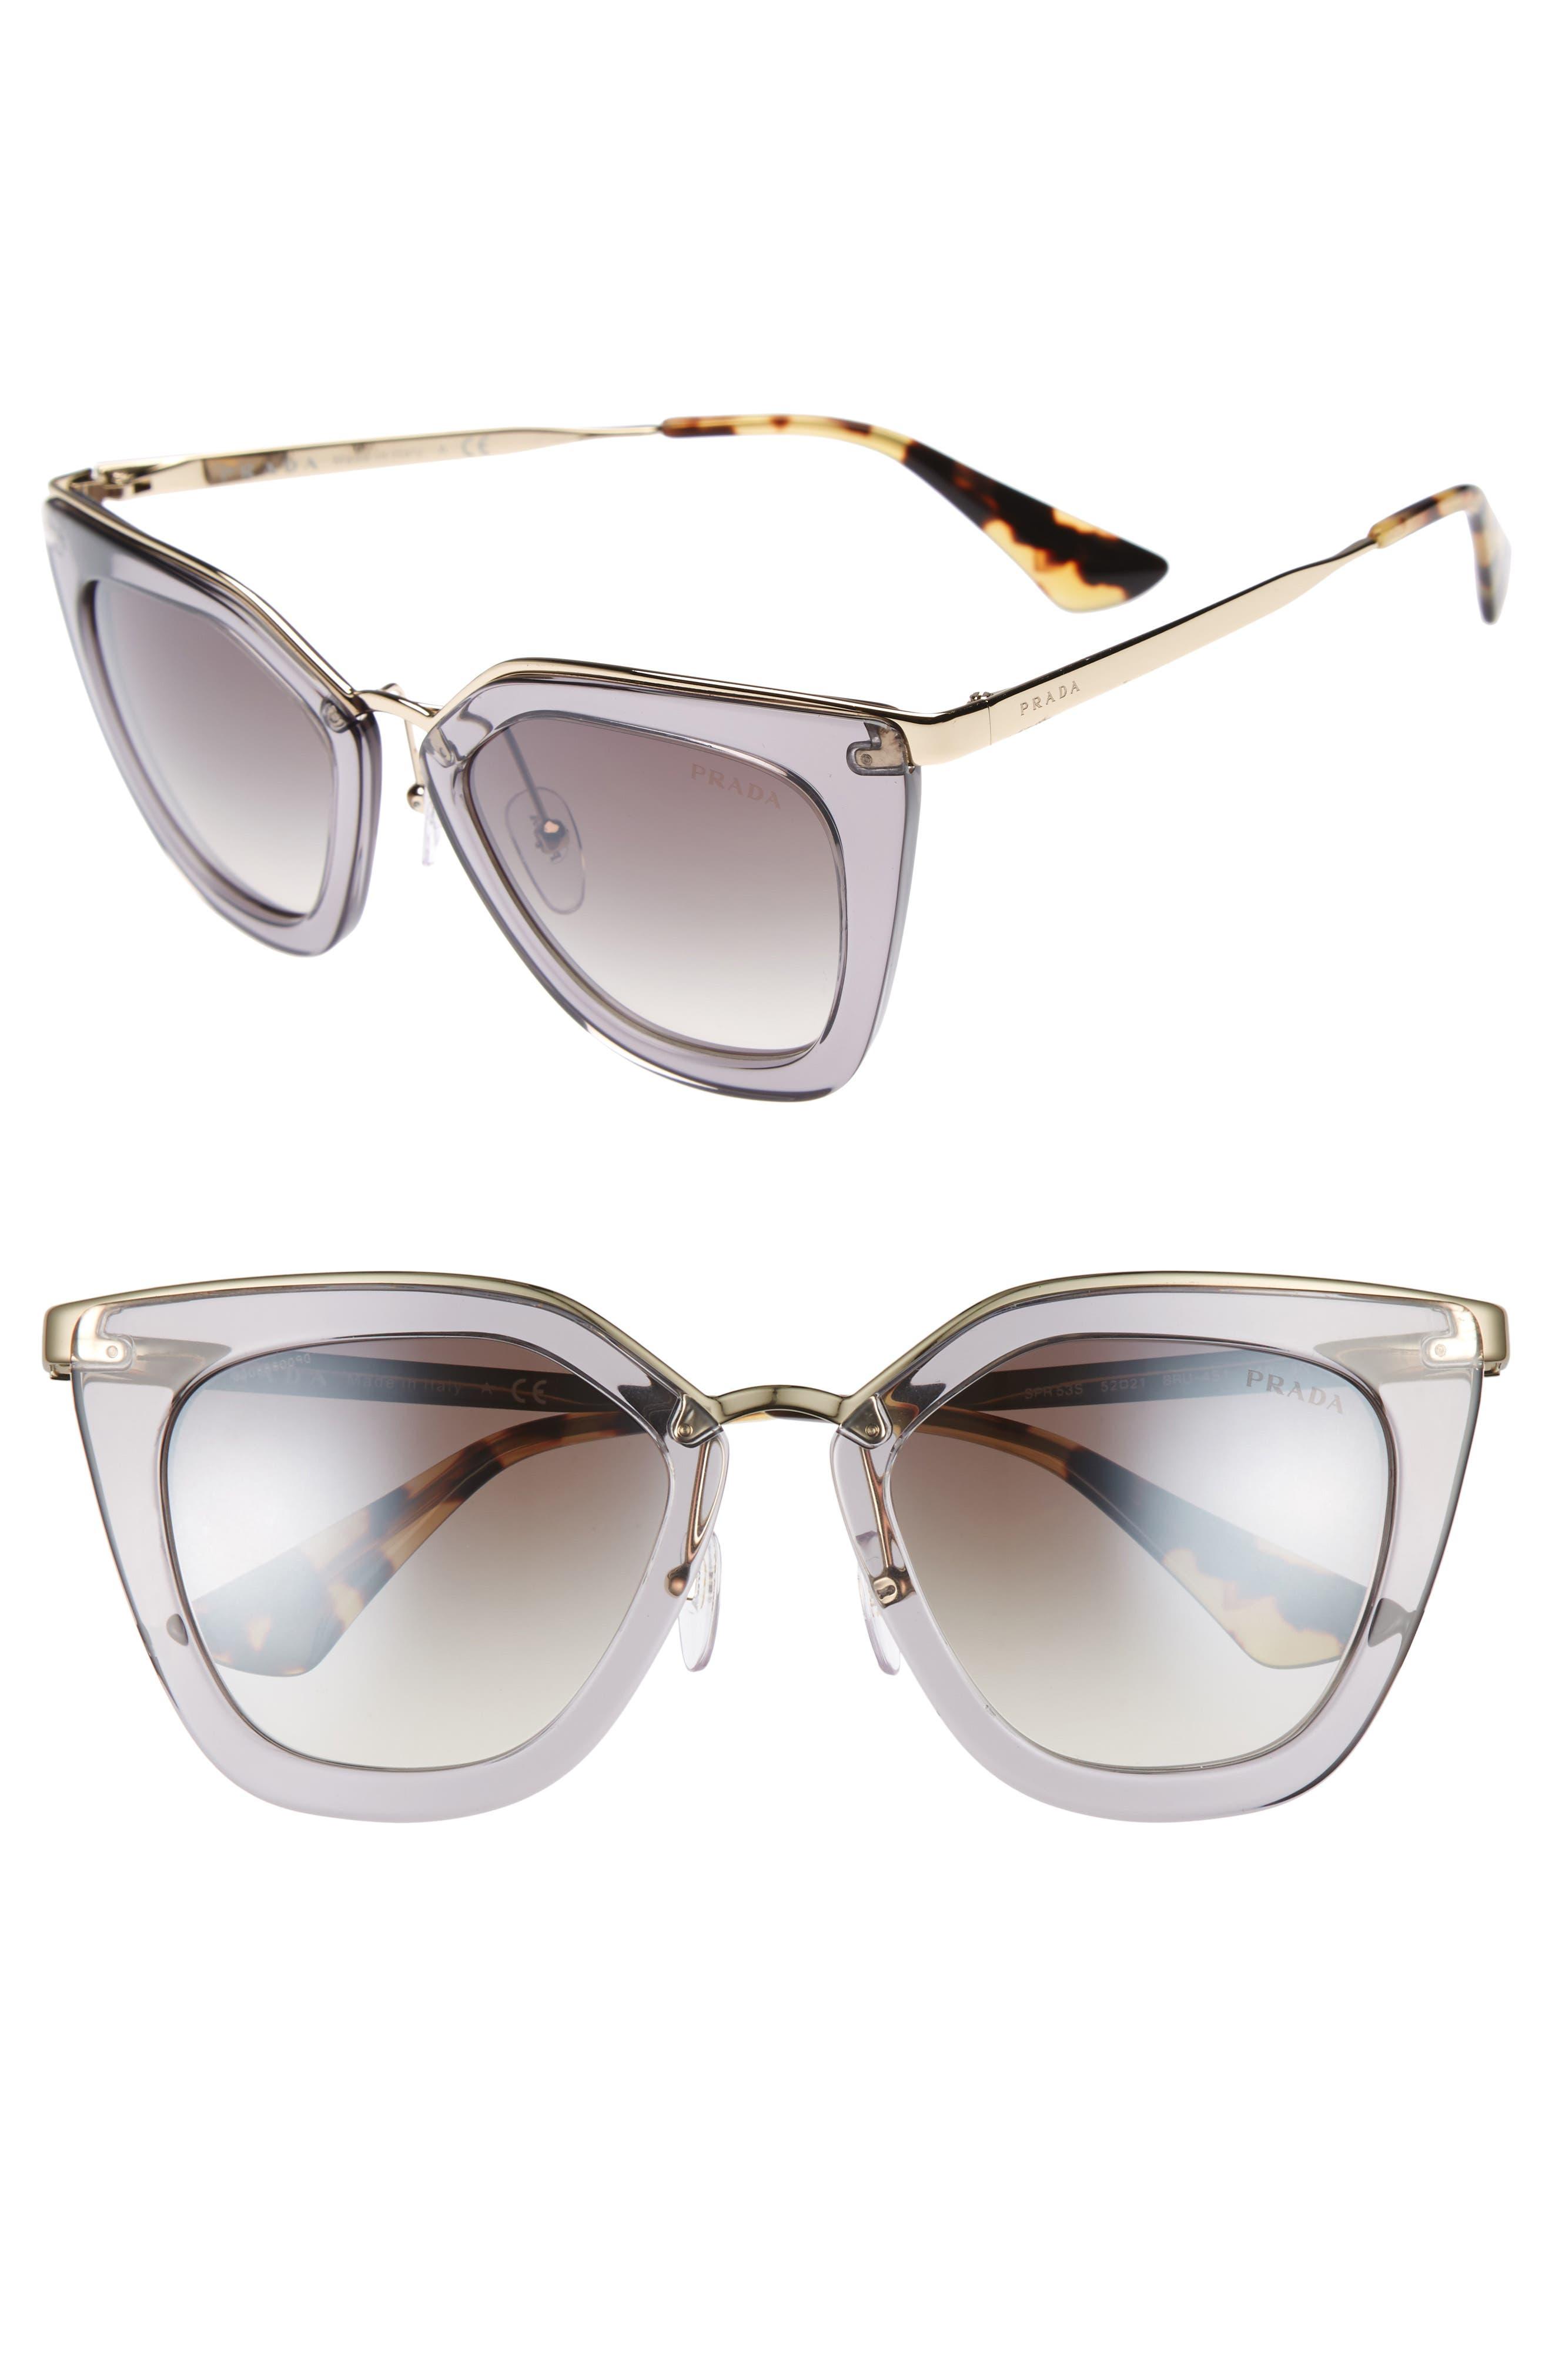 52mm Gradient Cat Eye Sunglasses,                         Main,                         color, Transparent Grey